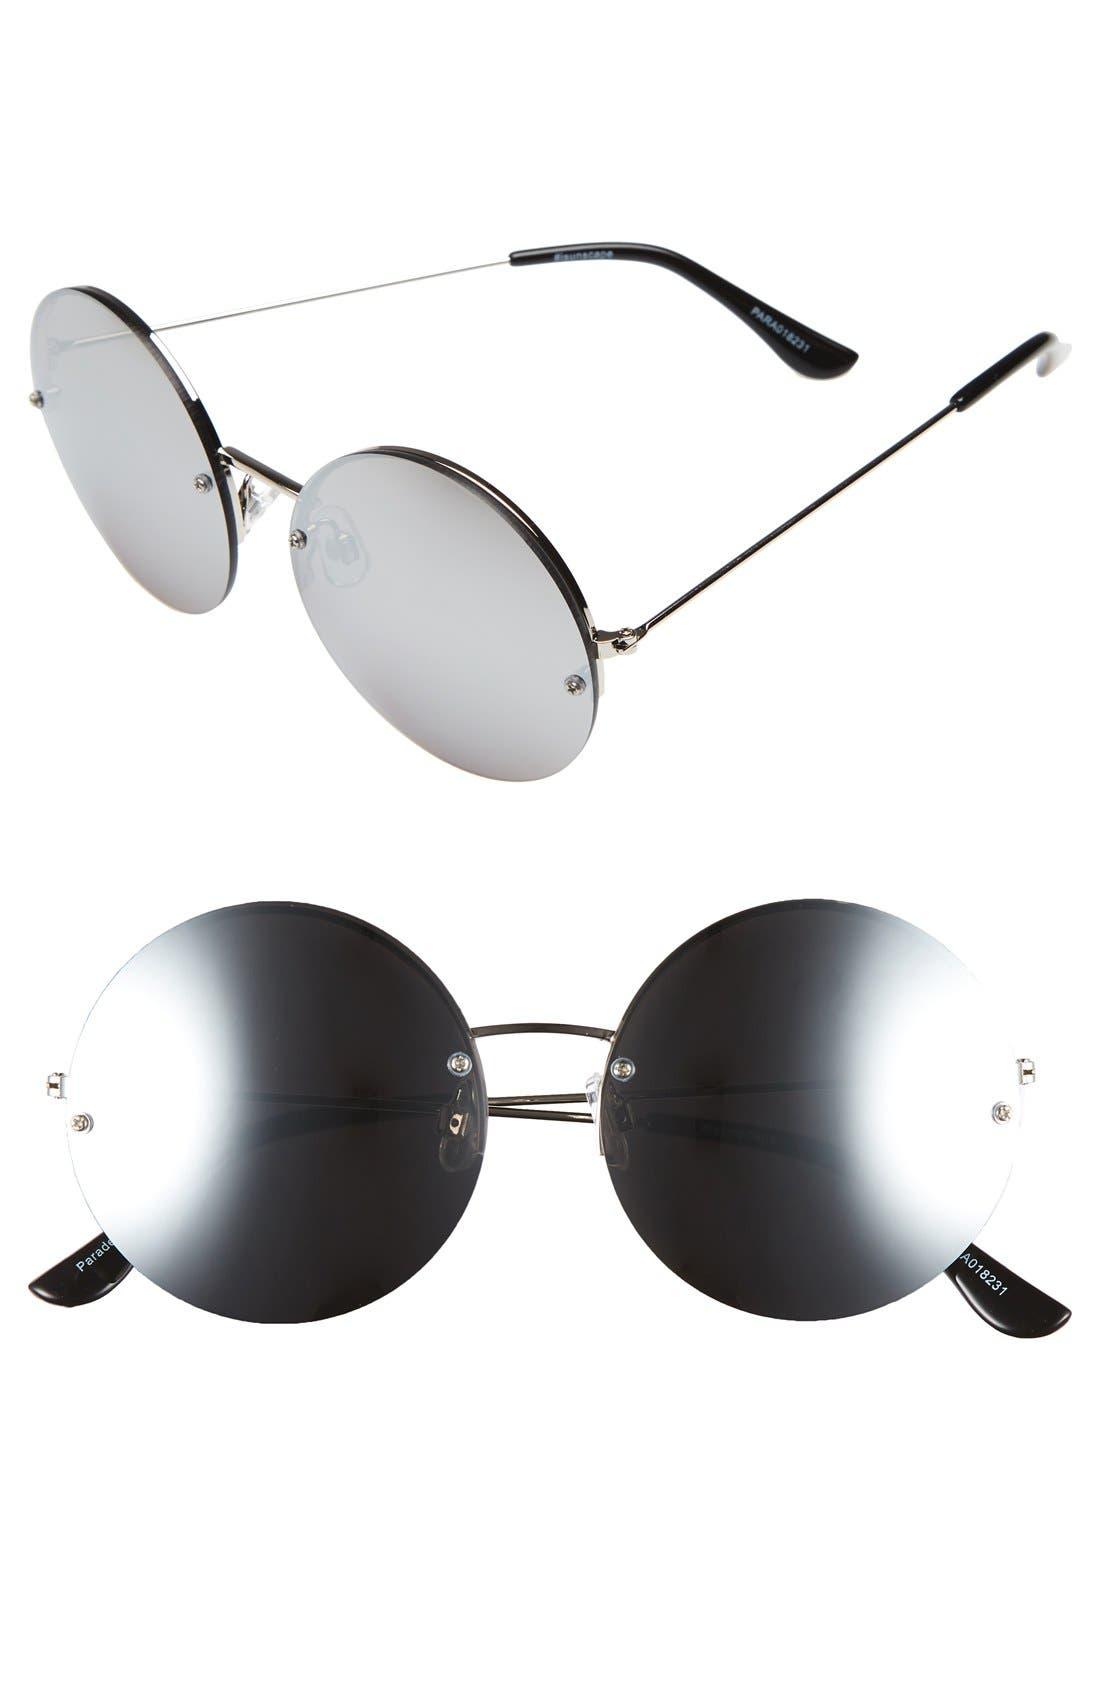 Alternate Image 1 Selected - BP. 55mm Rimless Mirrored Round Sunglasses